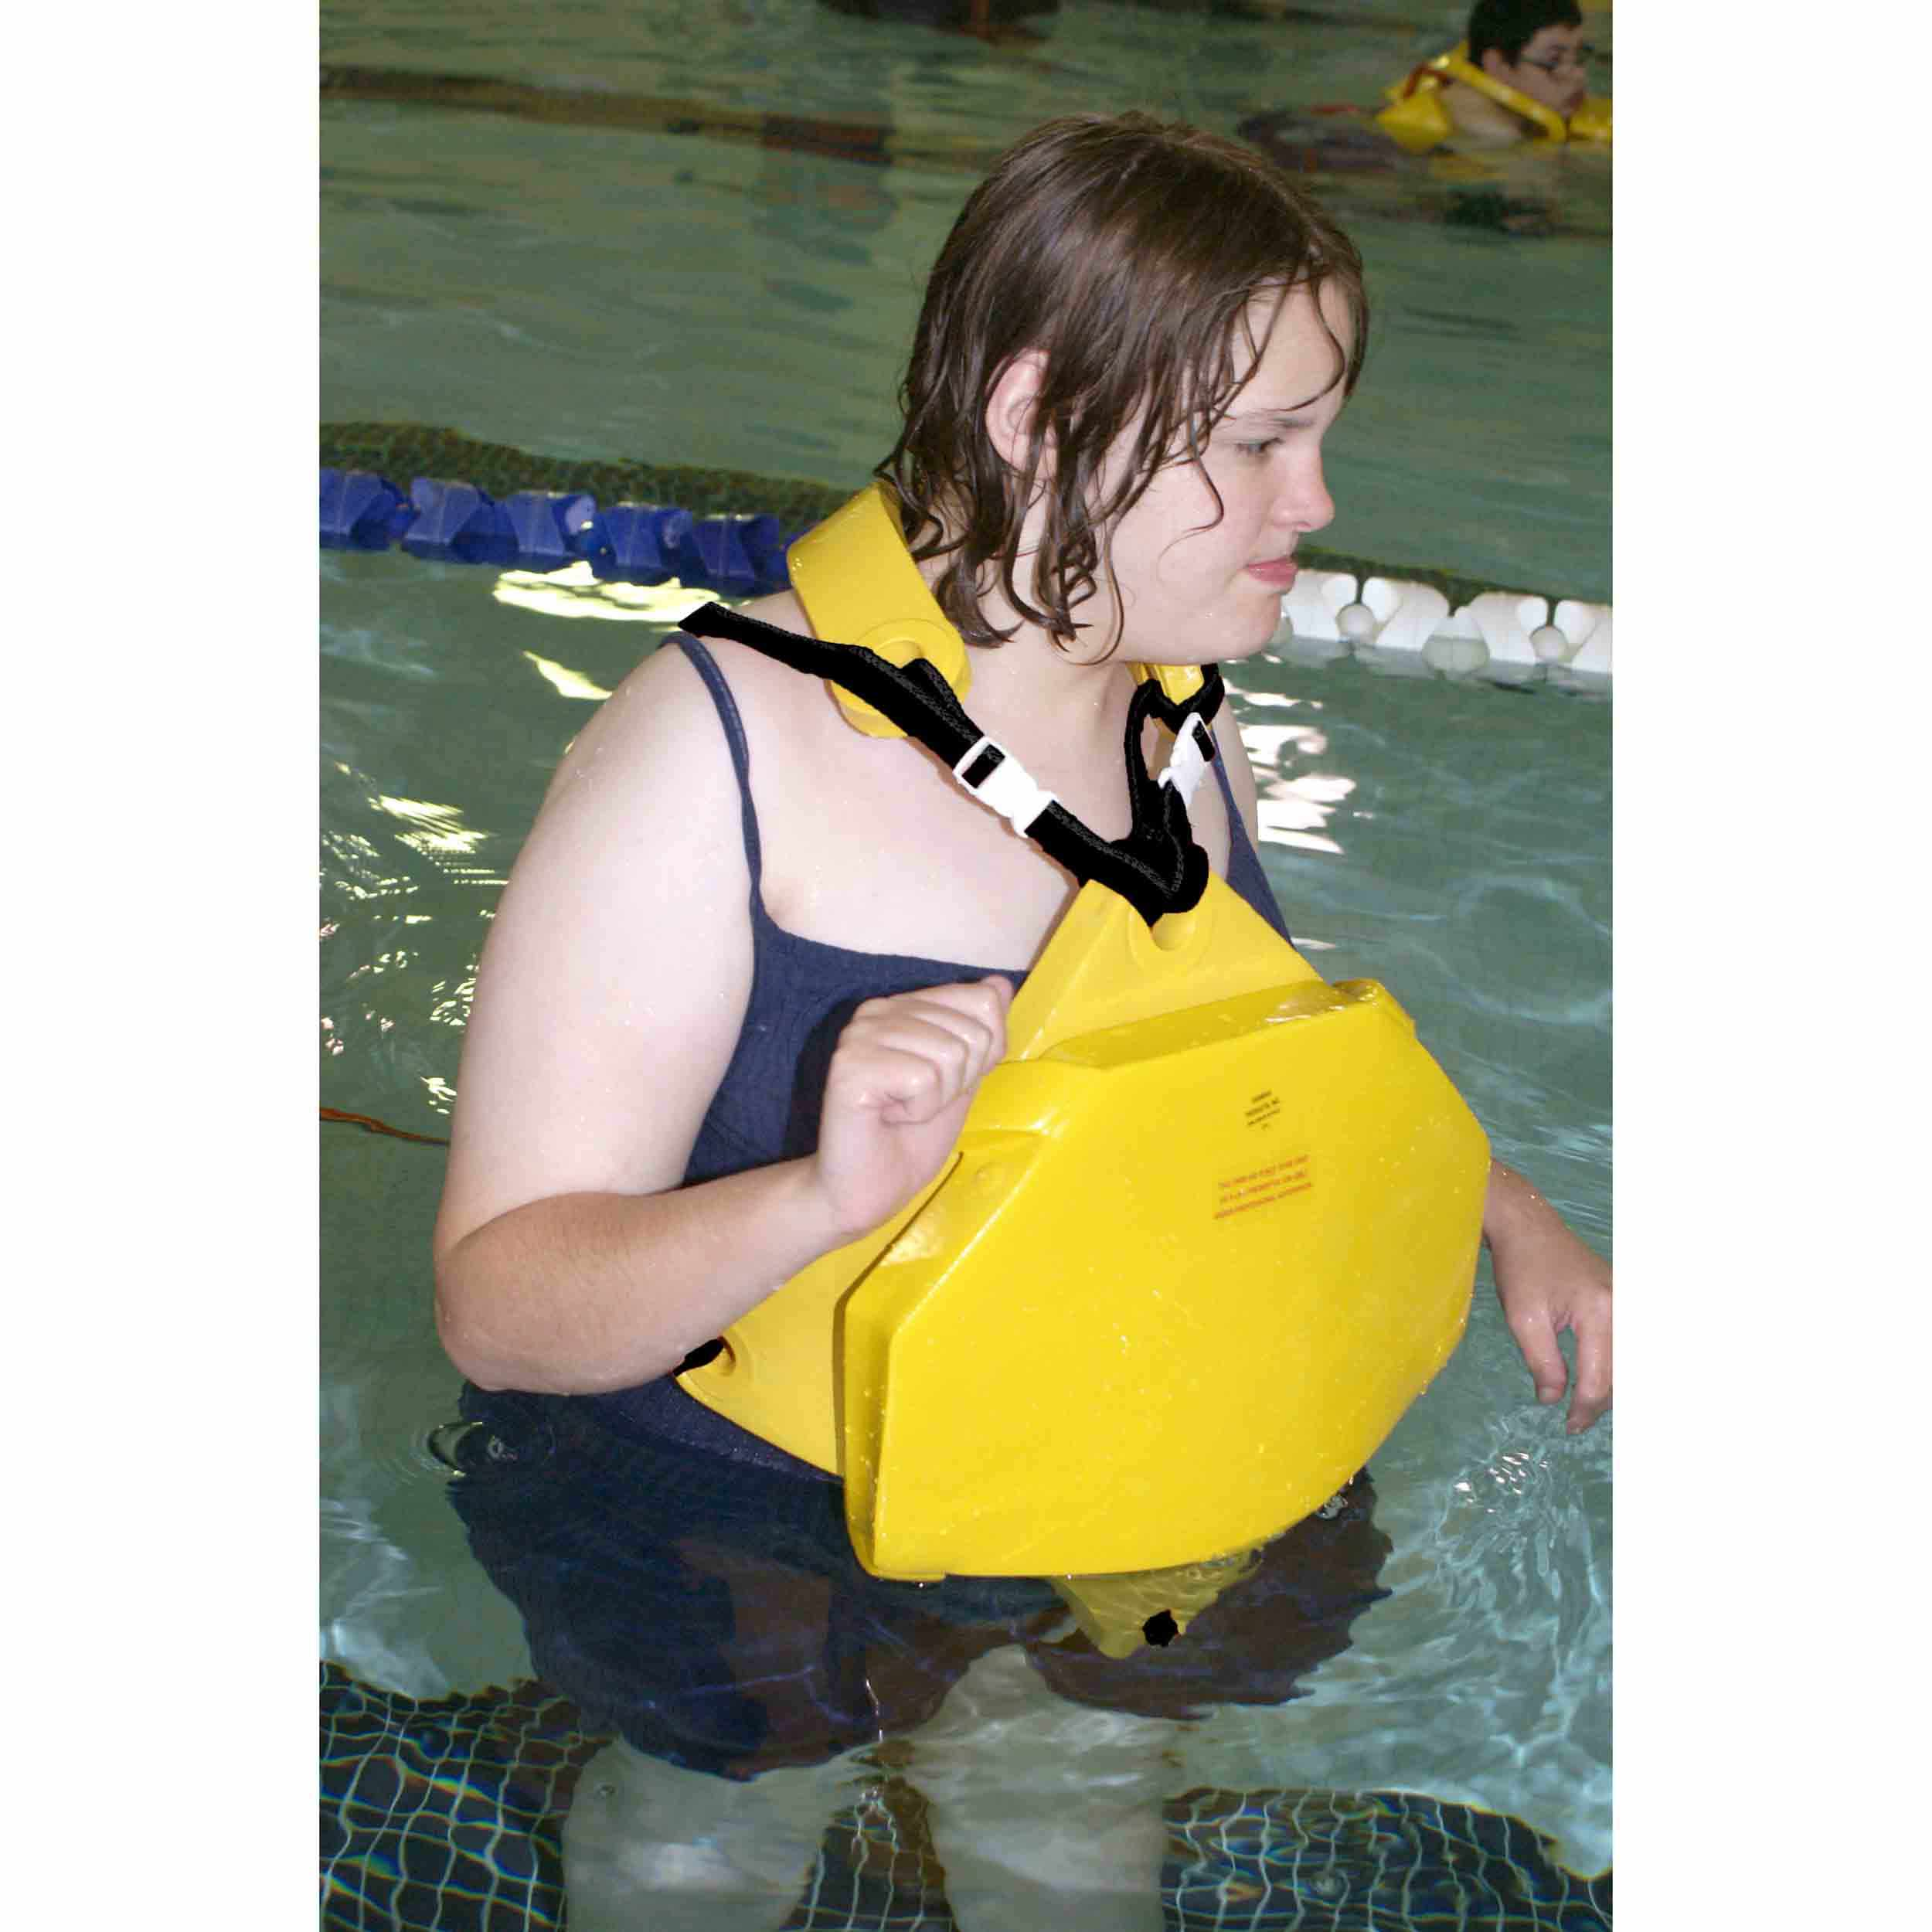 Danmar 8720 Delta Swim System | Danmar Products (8720)